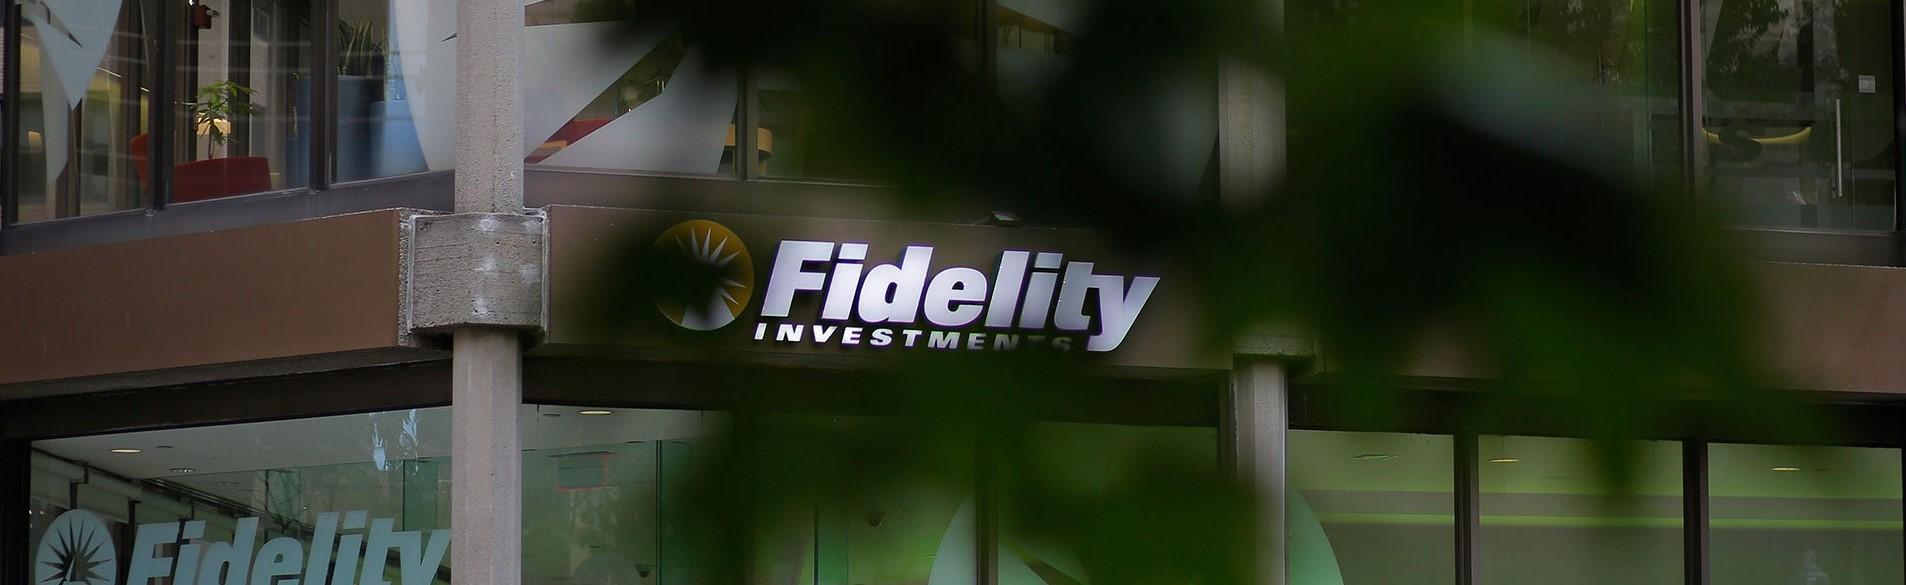 mdf2941239 - Более 10% акций майнинговой компании Hut 8 принадлежат Fidelity